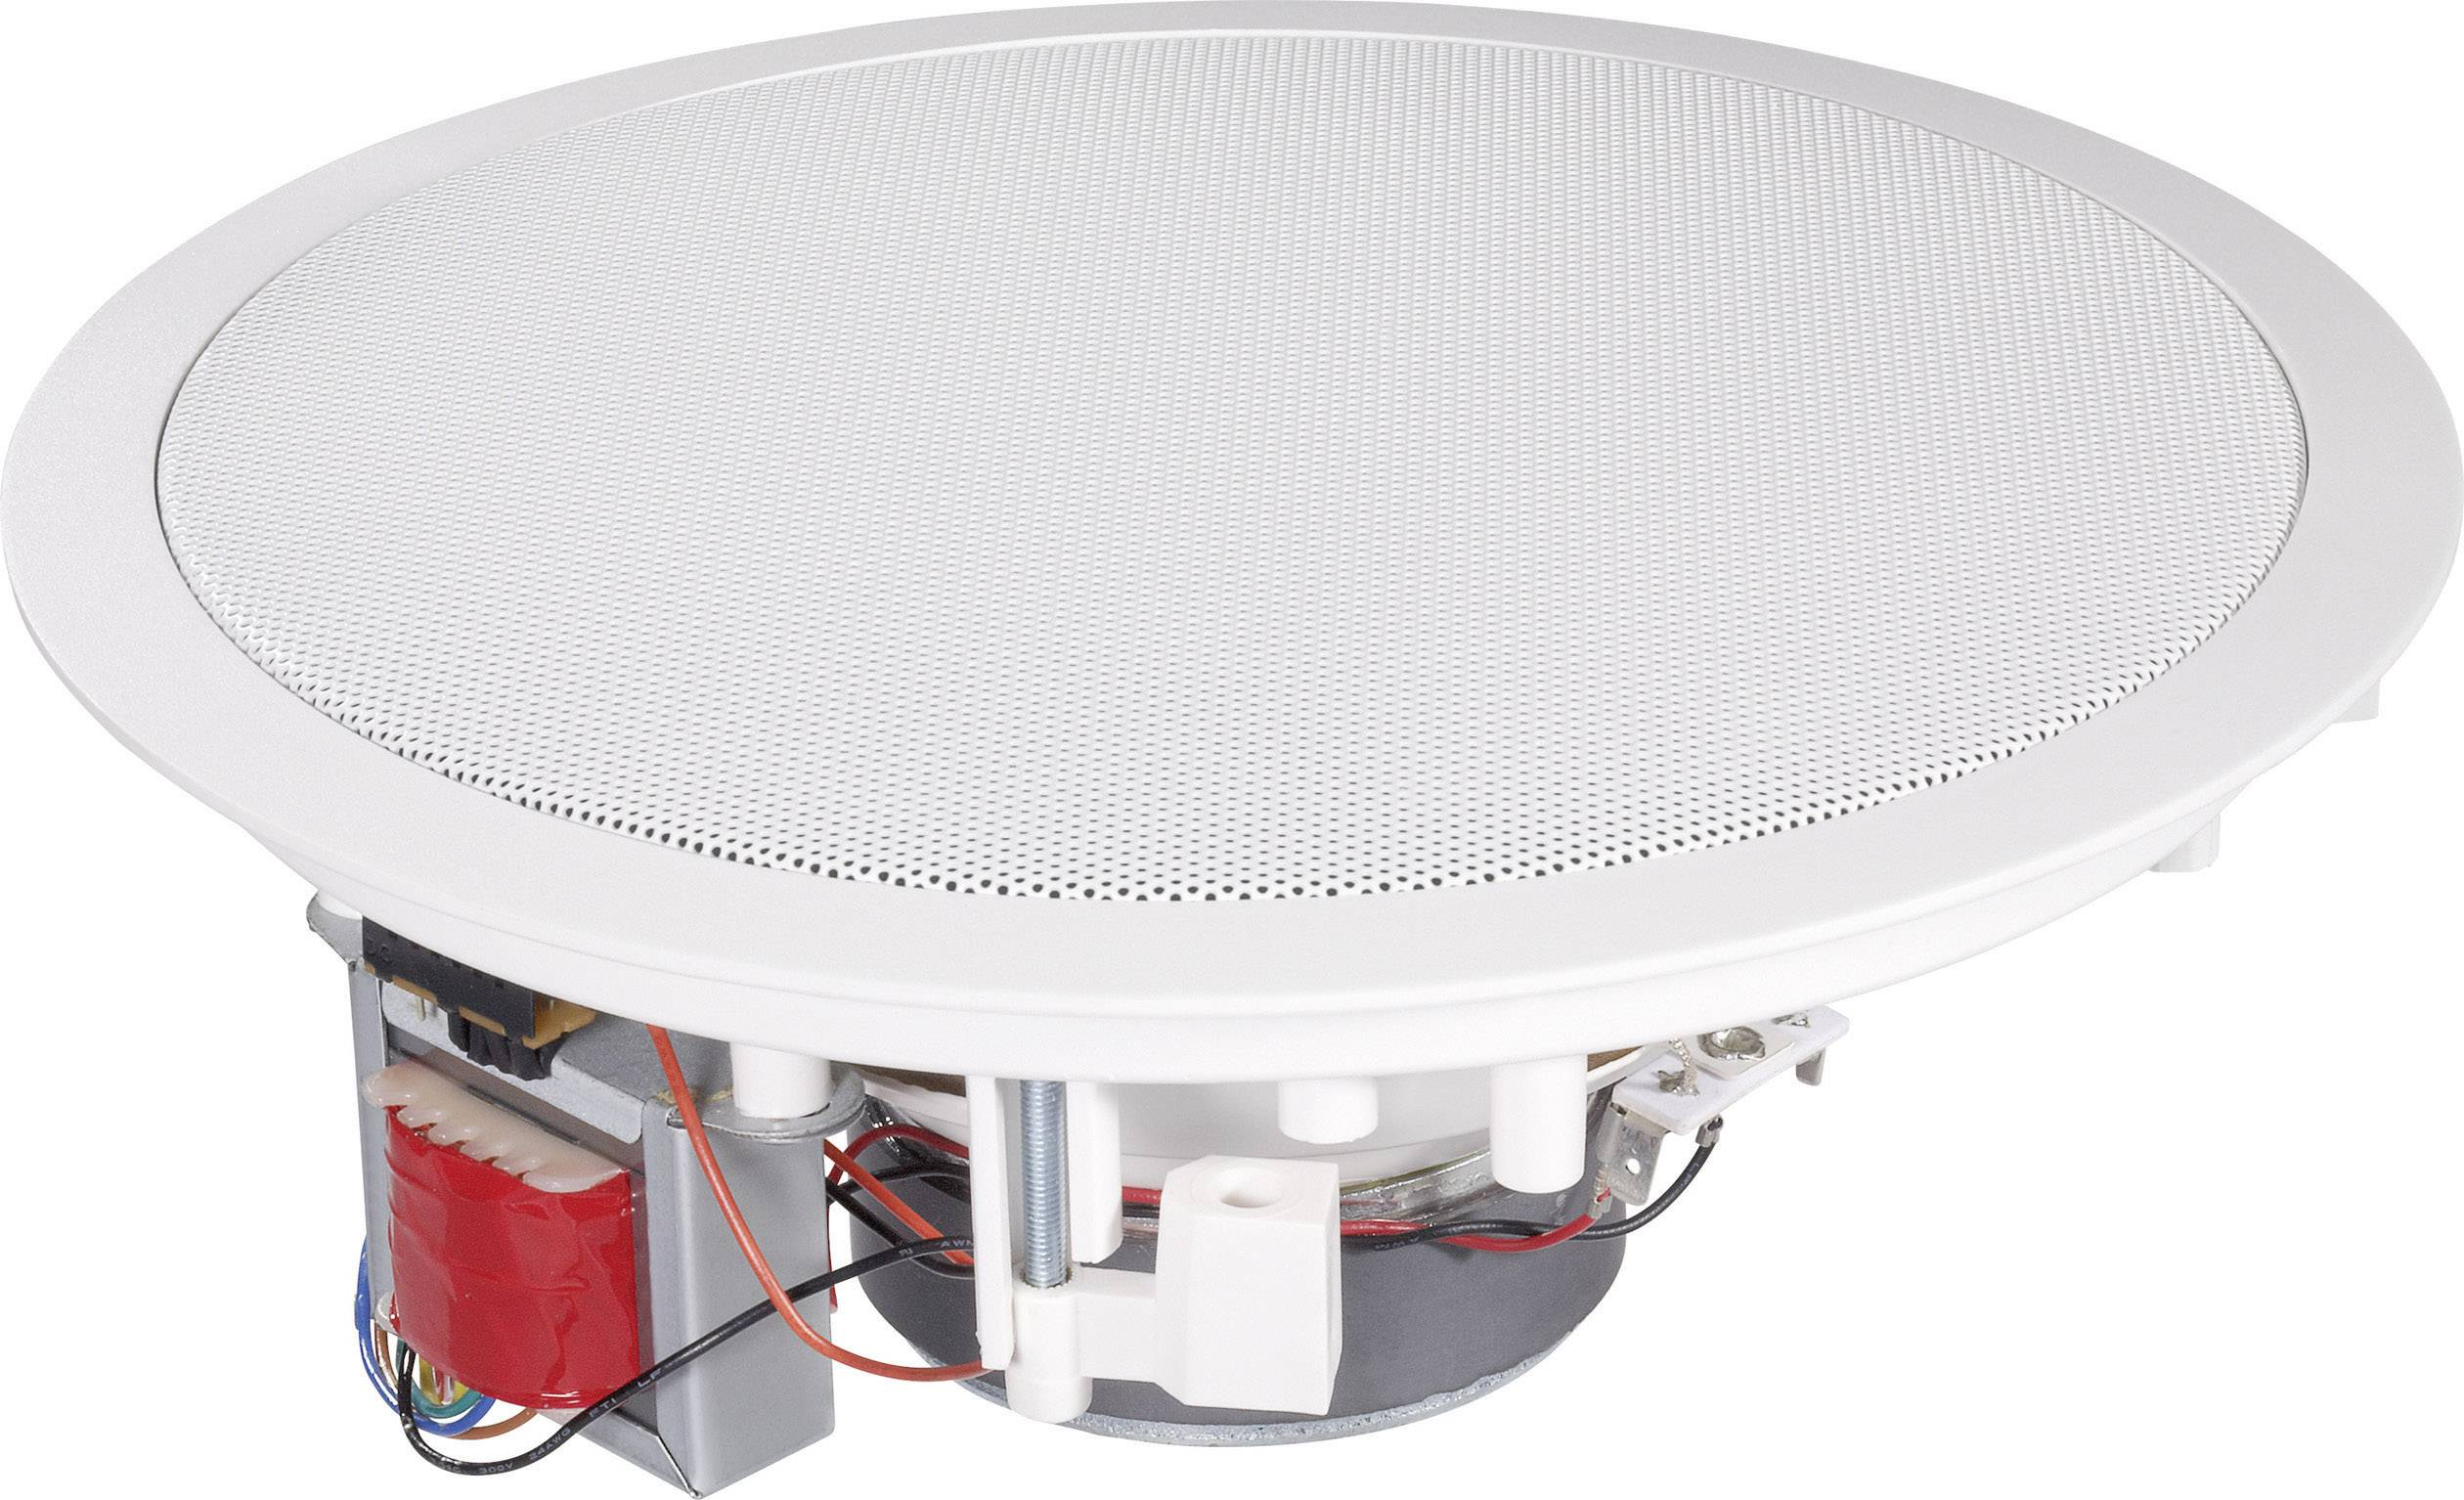 Stropní reproduktor ELA 200 mm , 8 Ω, 87 dB, 45/120 W